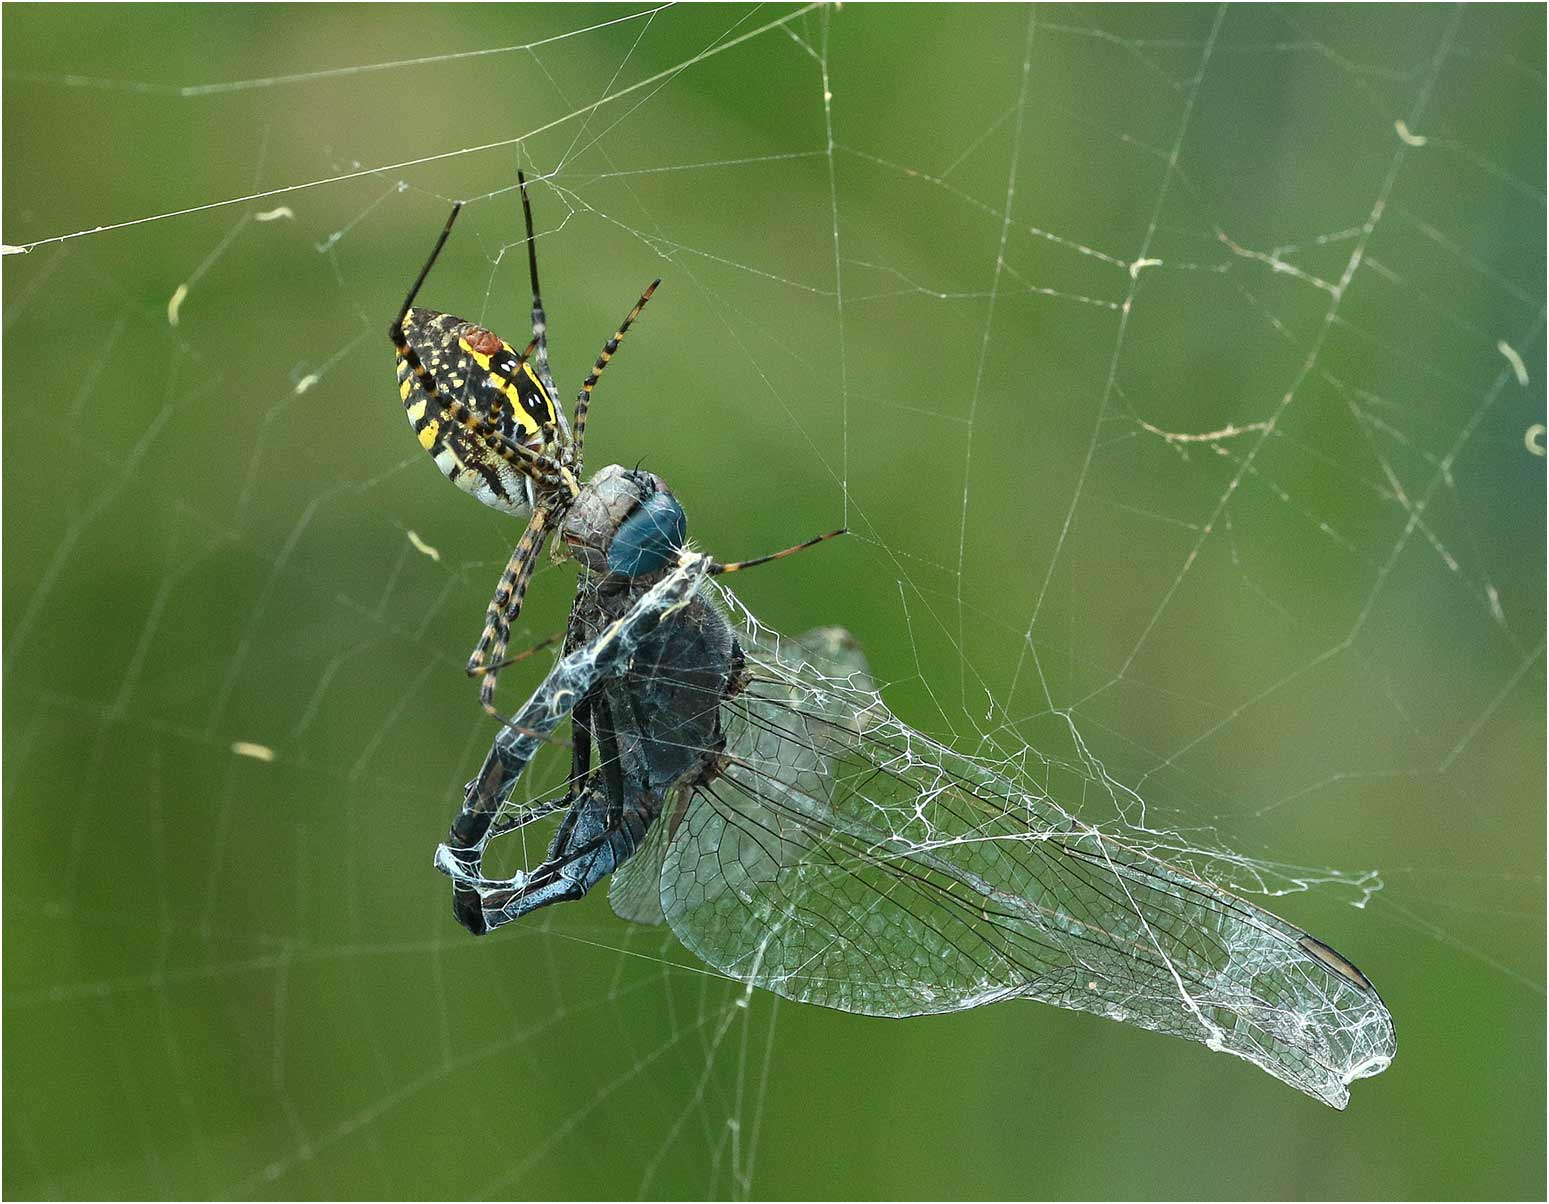 Orthetrum trinacria mâle victime d'une araignée, Namibie, Singalamwe, 12/02/2020